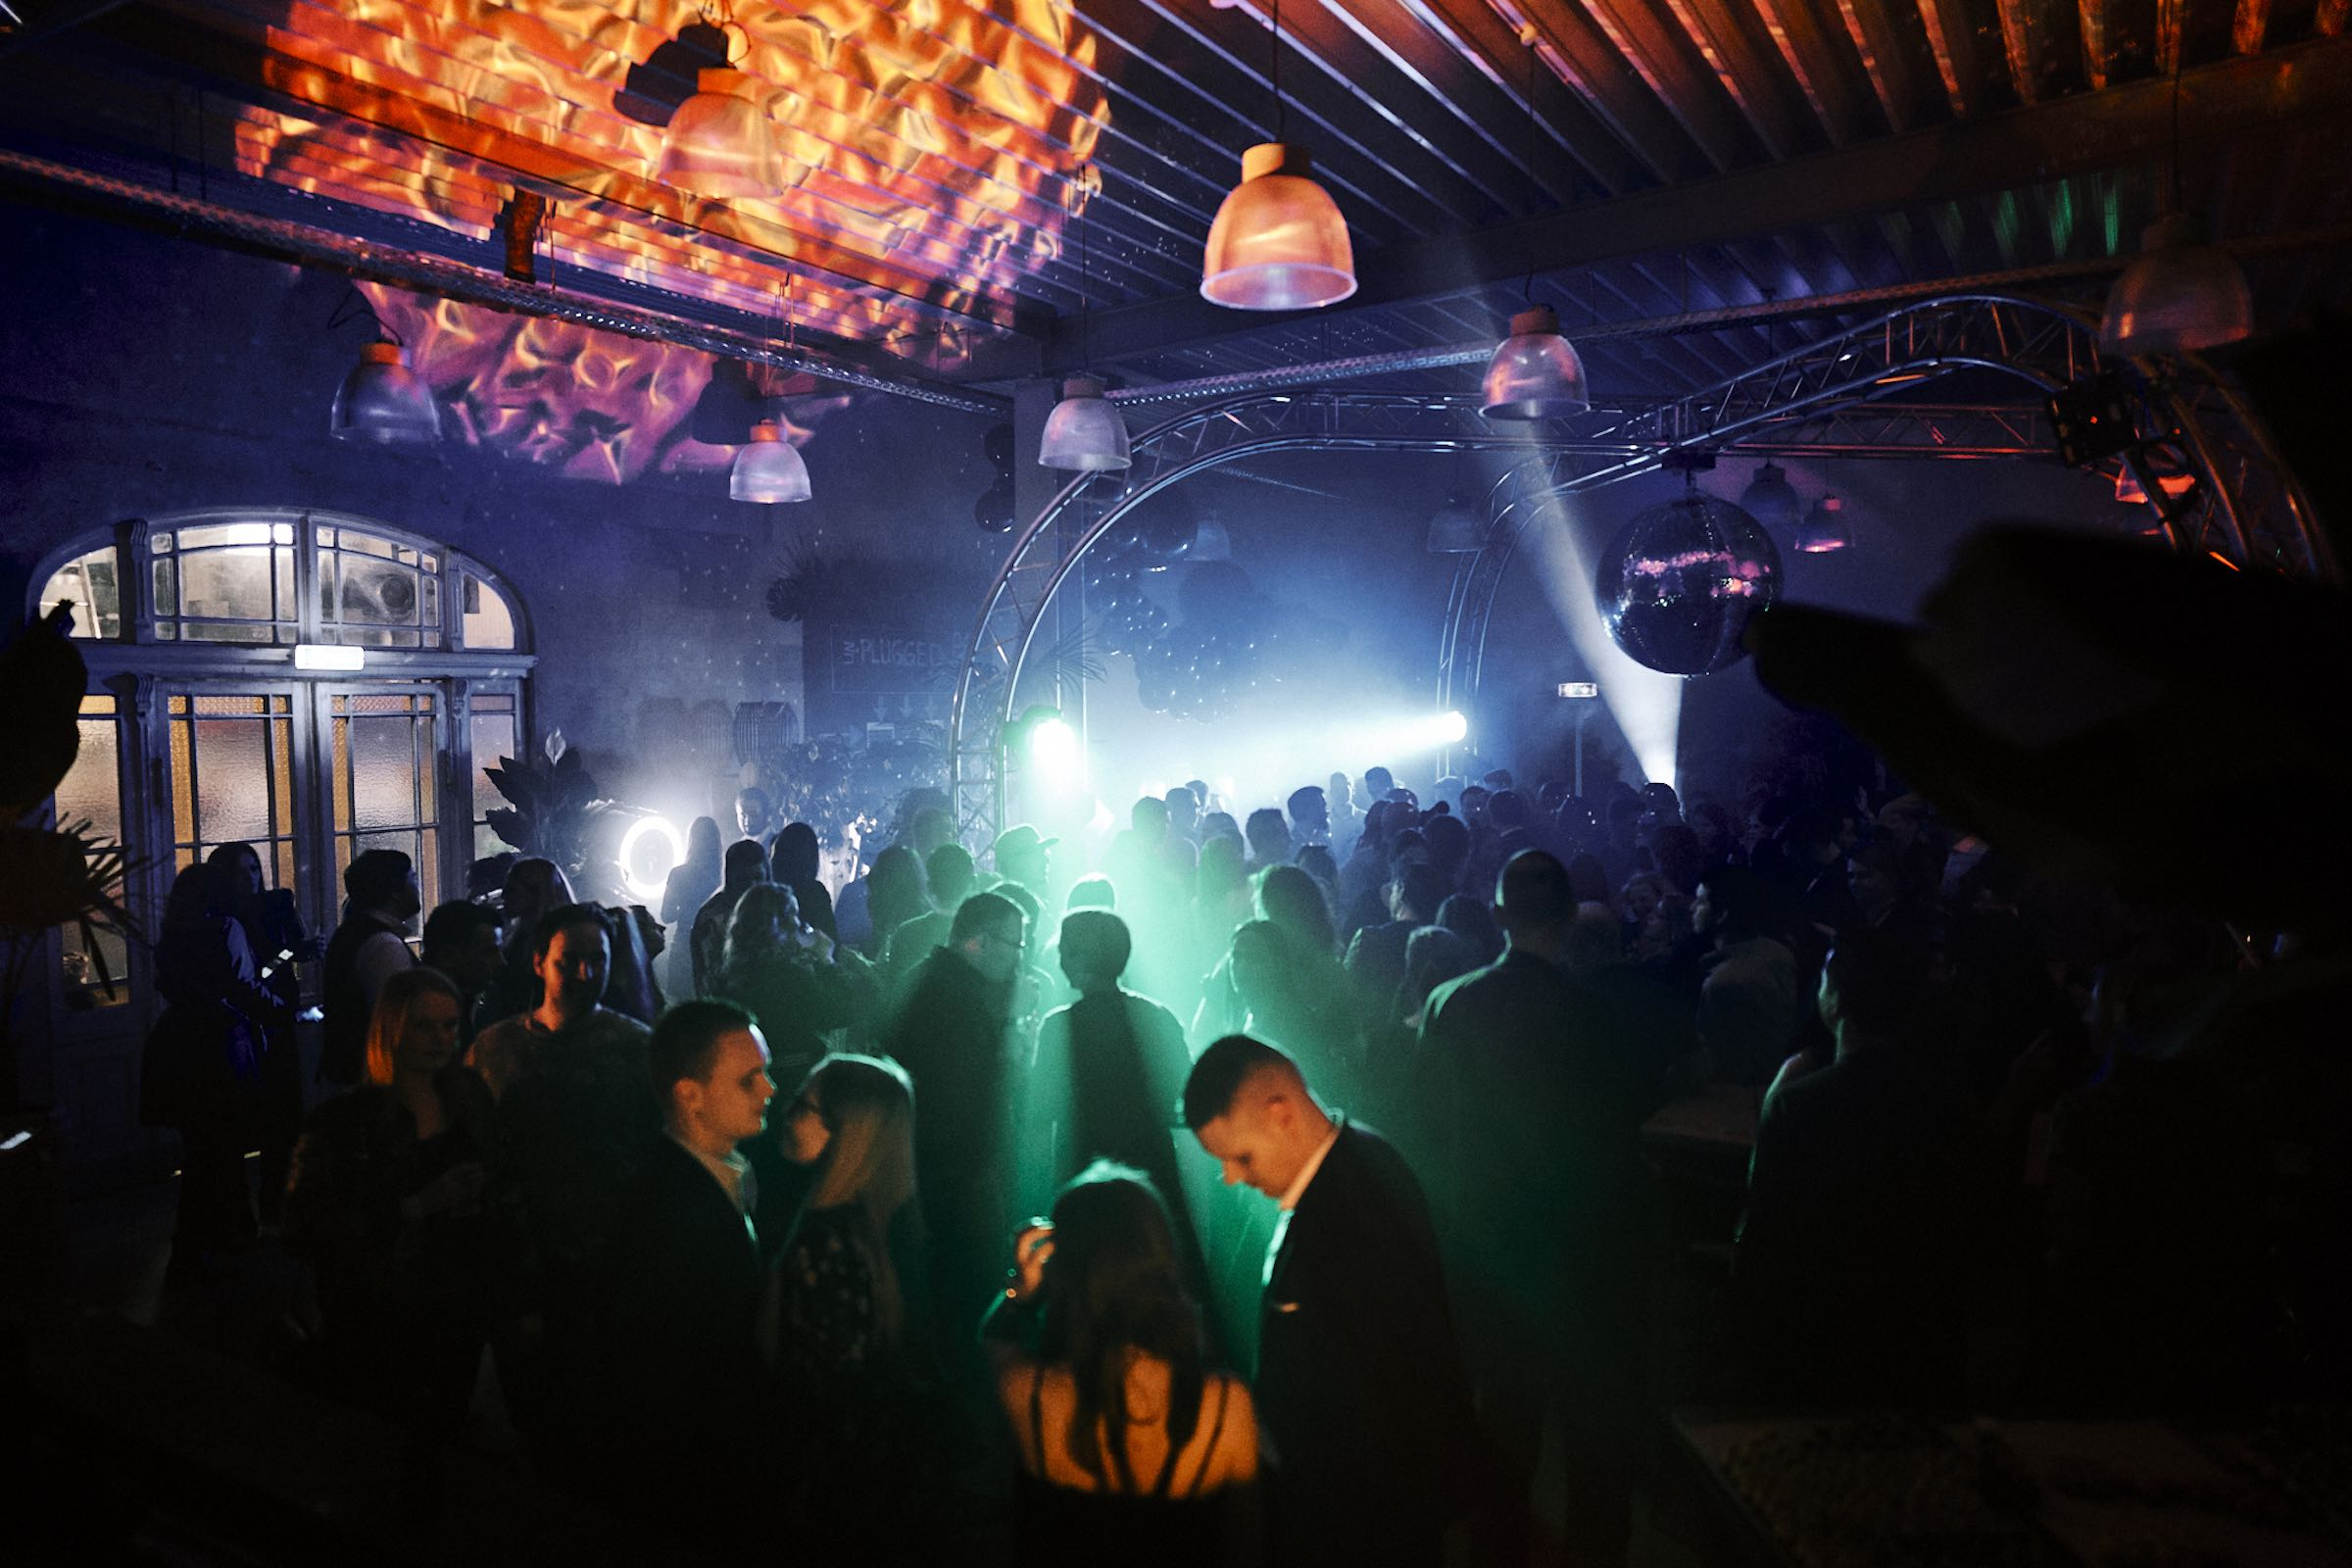 DJ | Agentur | Hannover | DJ | Service | DJ | Feier | Hochzeits | DJ | Messe | DJ | Firmenevent | Firmenfeier | DJ | Geburtstag | Discjockey | Weihnachtsfeier | DJ | Sommerfest | Event | Buchen | Mieten | Lehmann | Eventservice